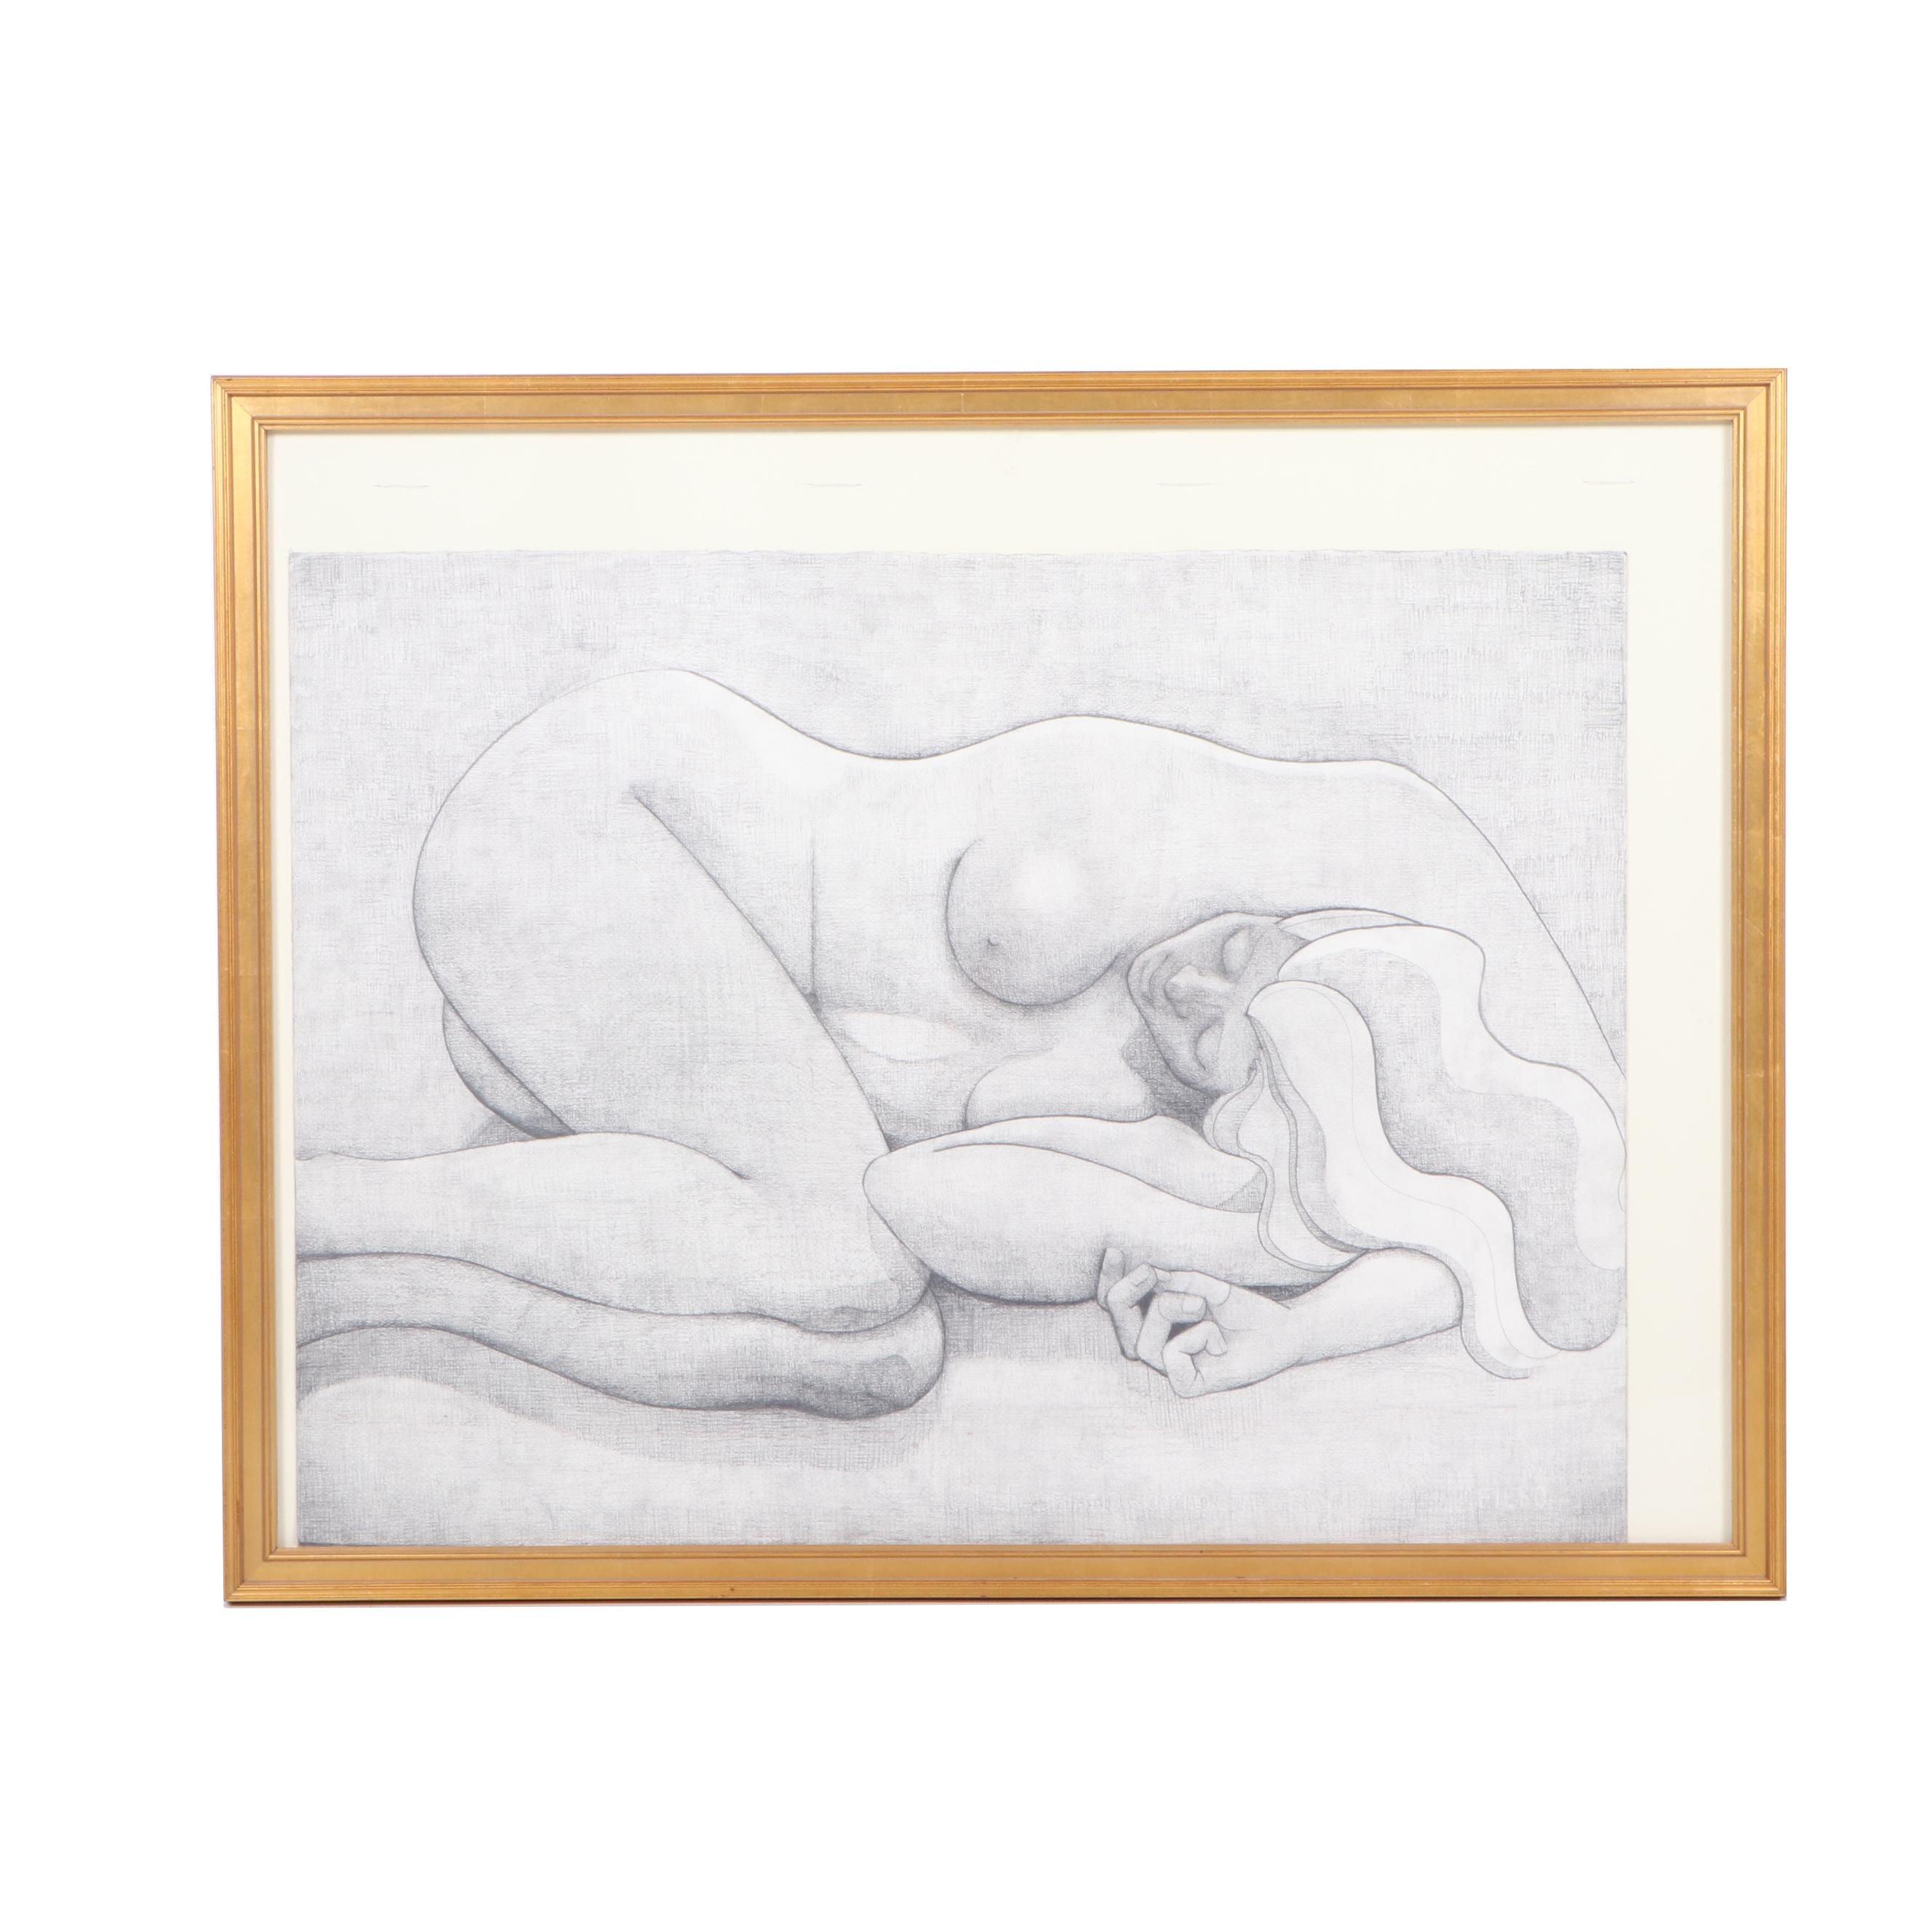 Fiero Figural Drawing